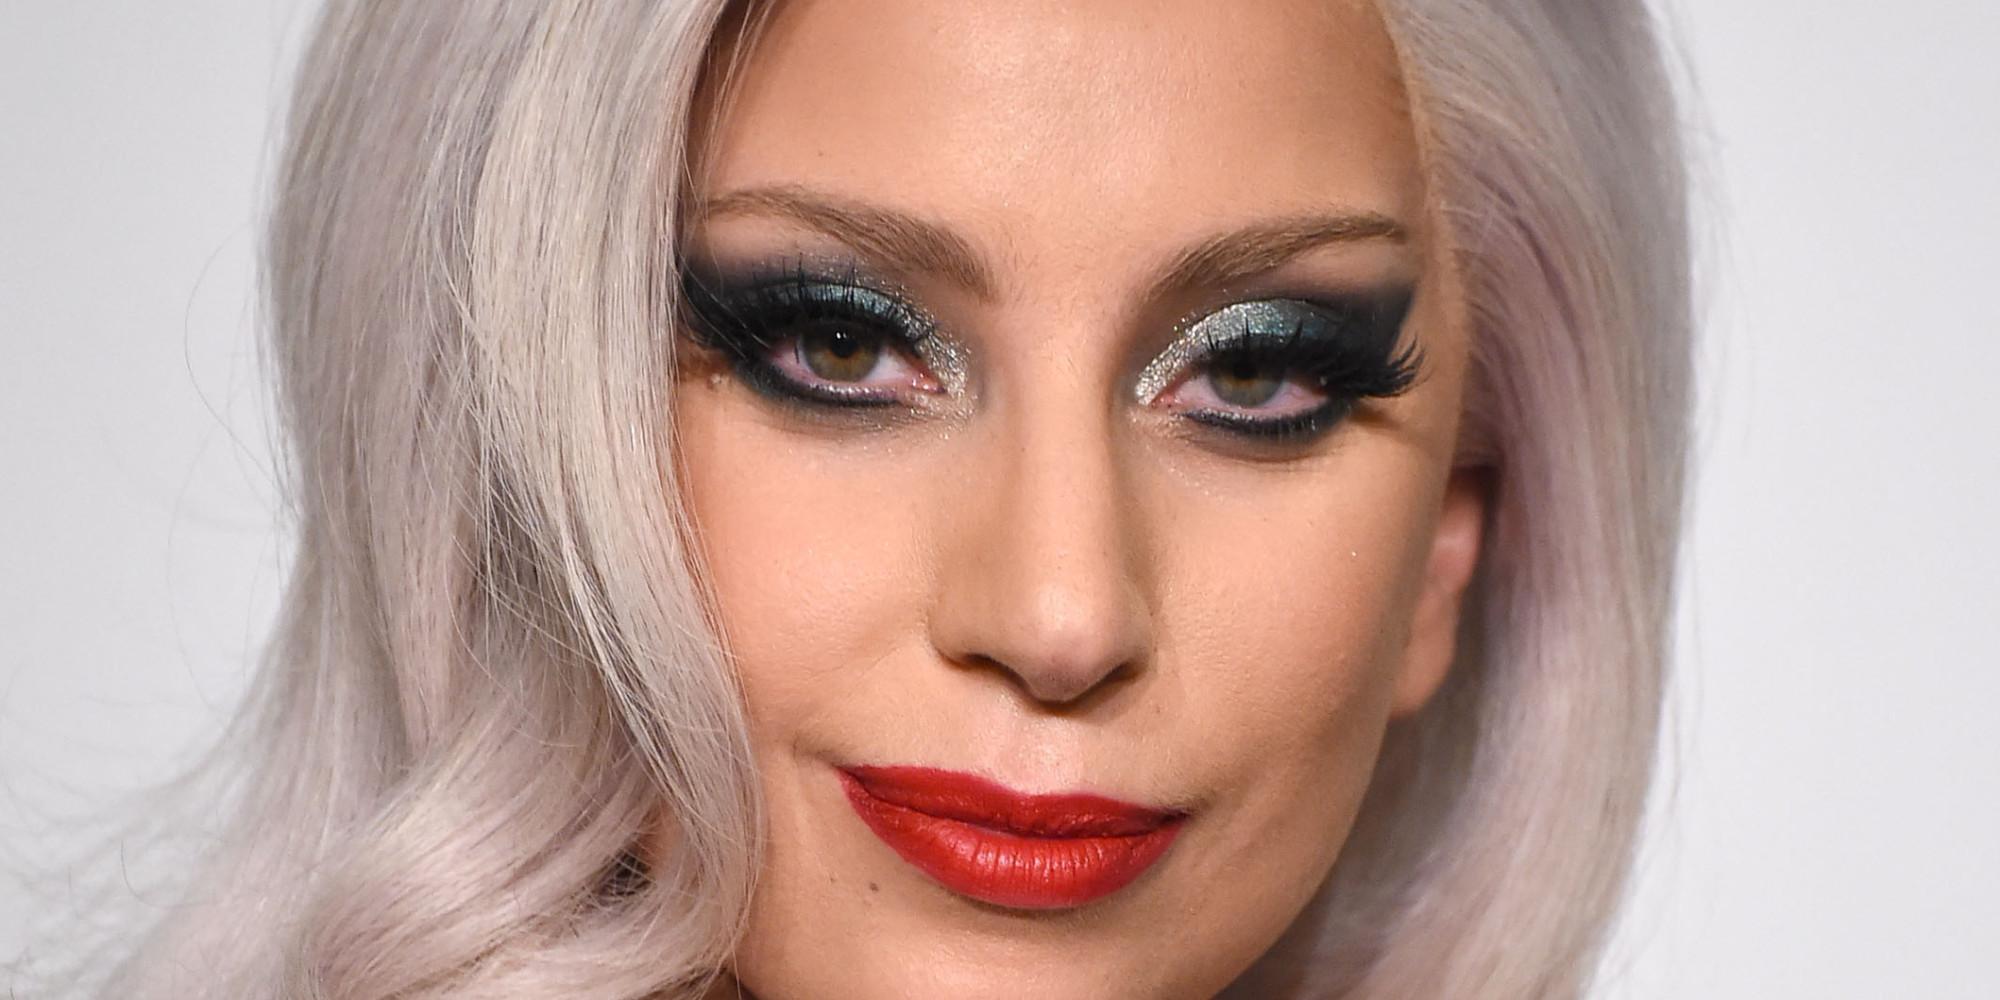 2000x1000 > Lady Gaga Wallpapers